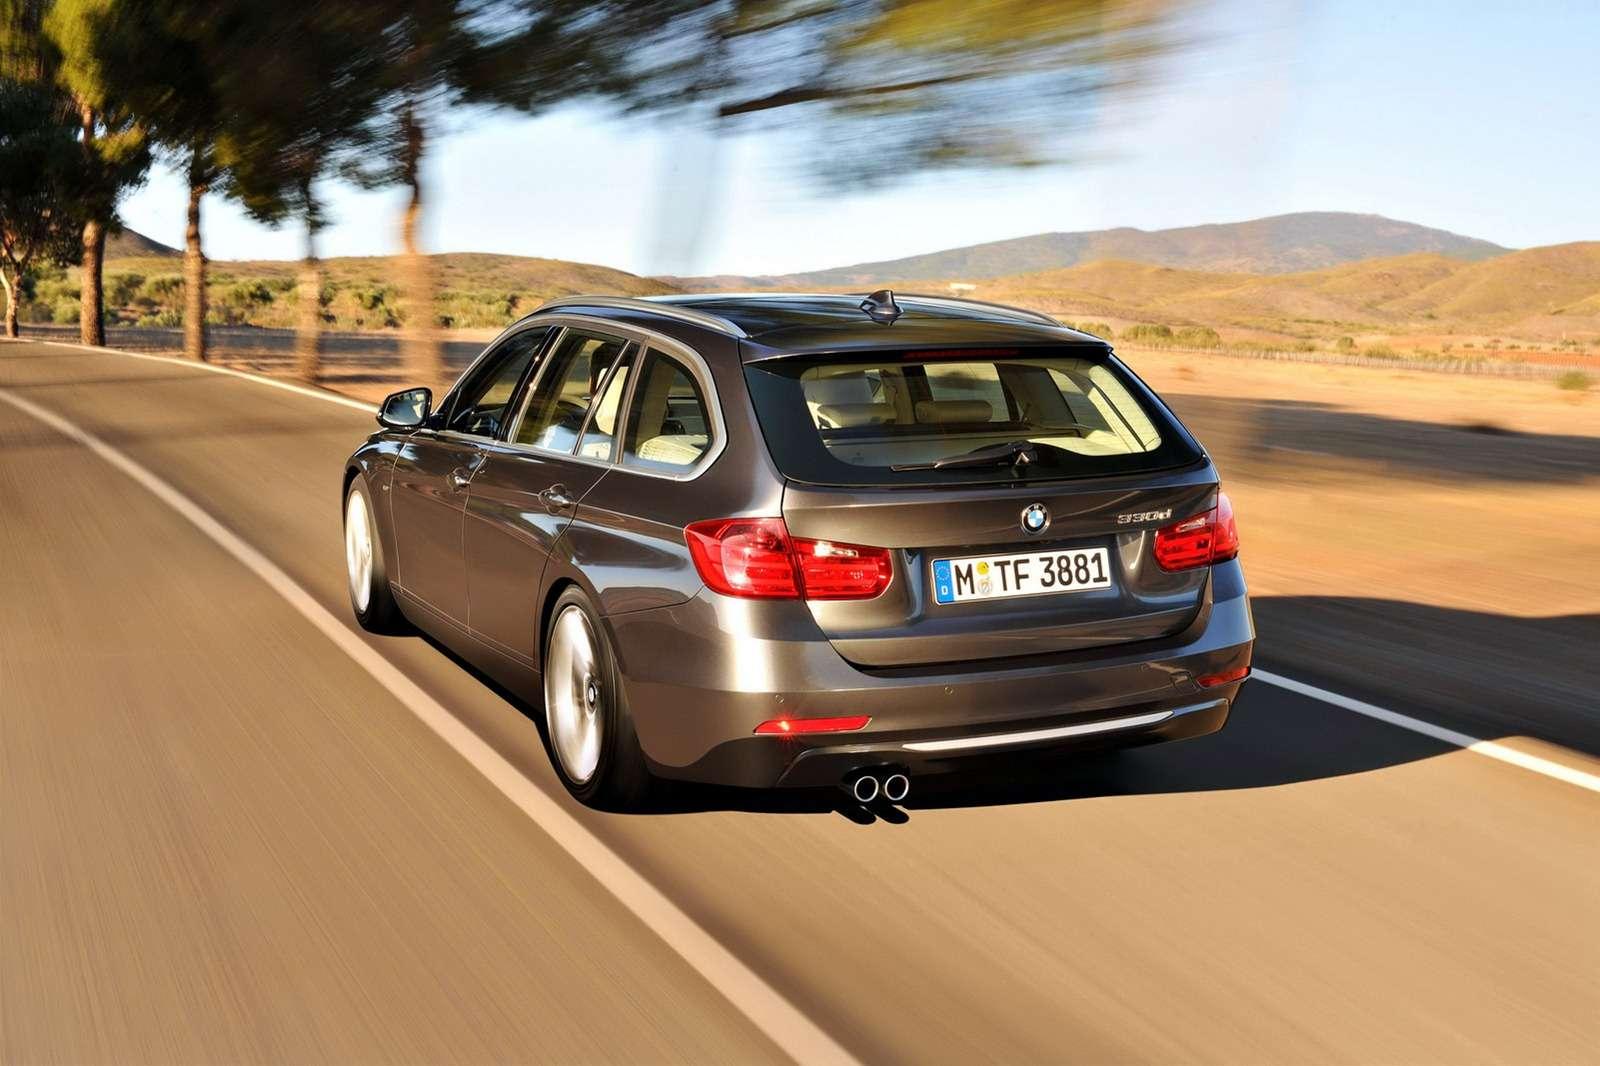 BMW serii 3 Touring 2013